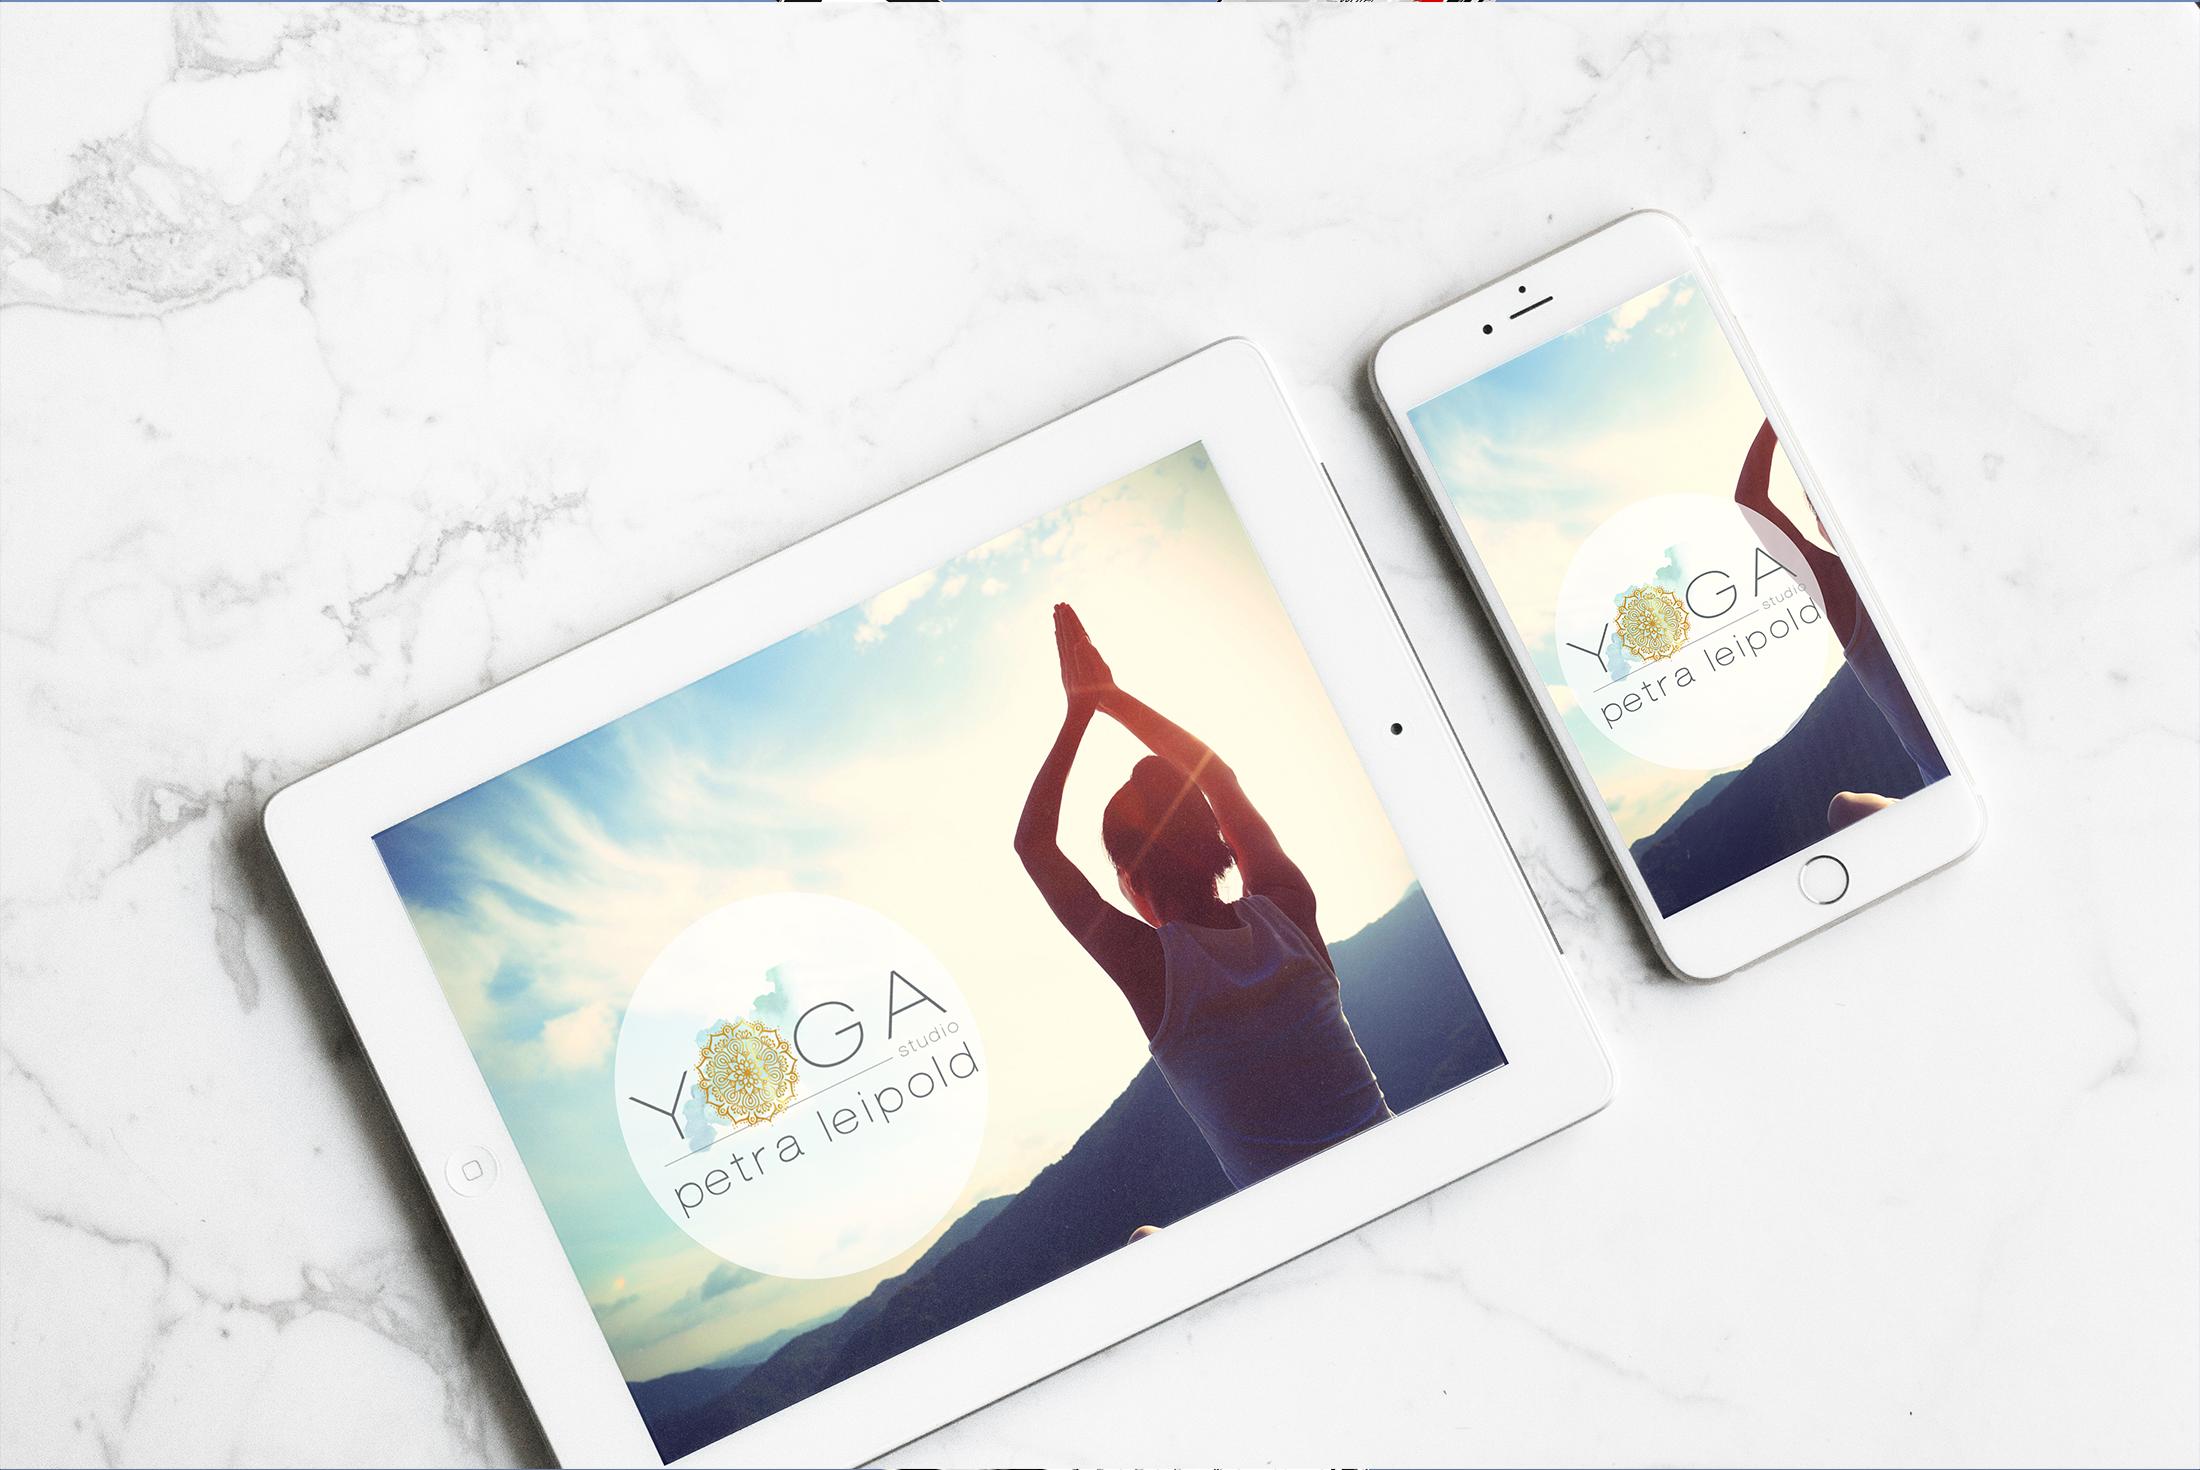 acaf57de4a63bc Website - Yogastudio Geiselhöring - NP MARKETING